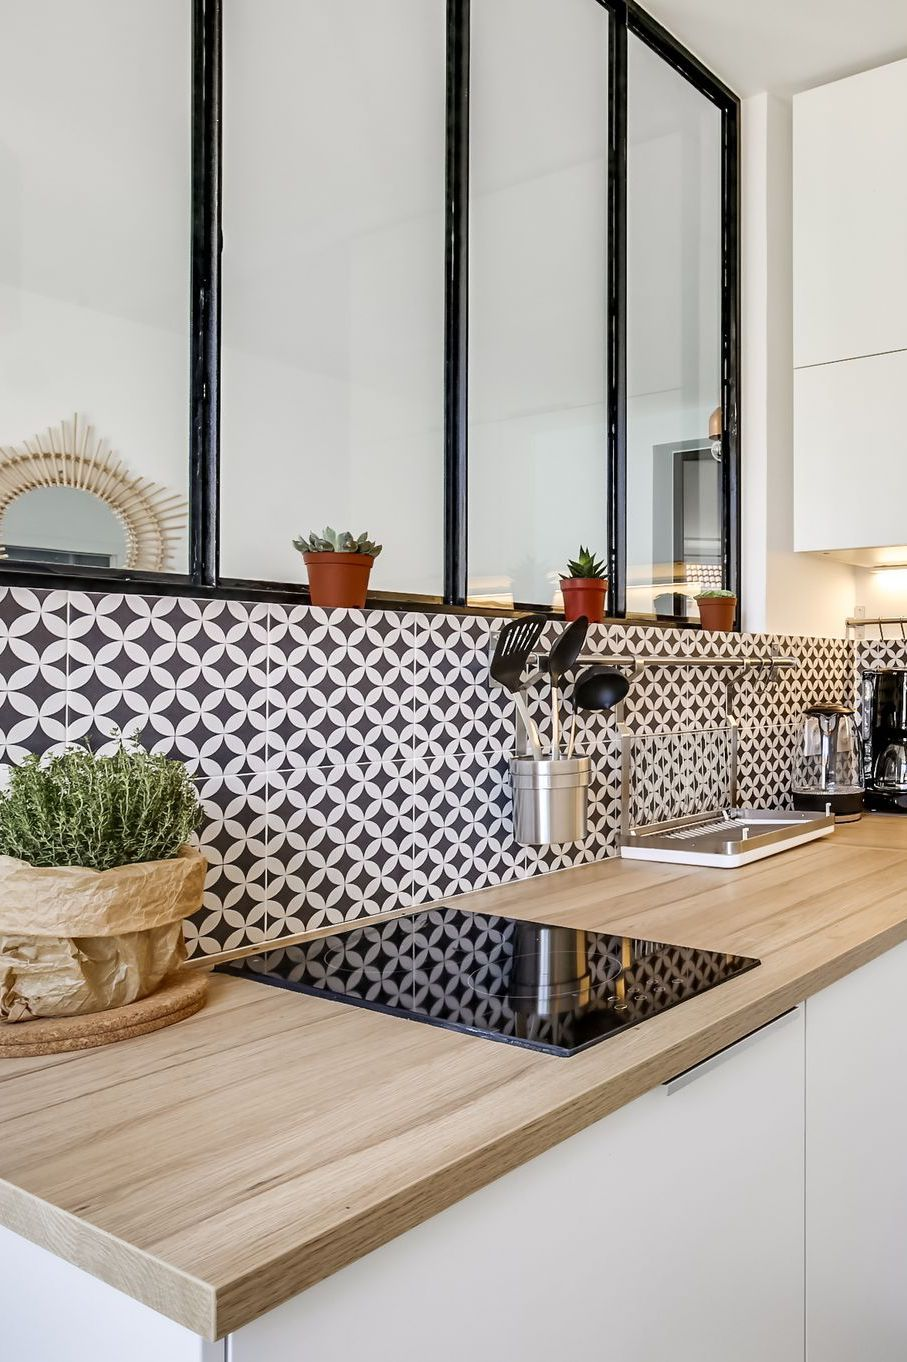 Cuisine avec verrière | Home sweet home | Haus küchen, versteckte ...